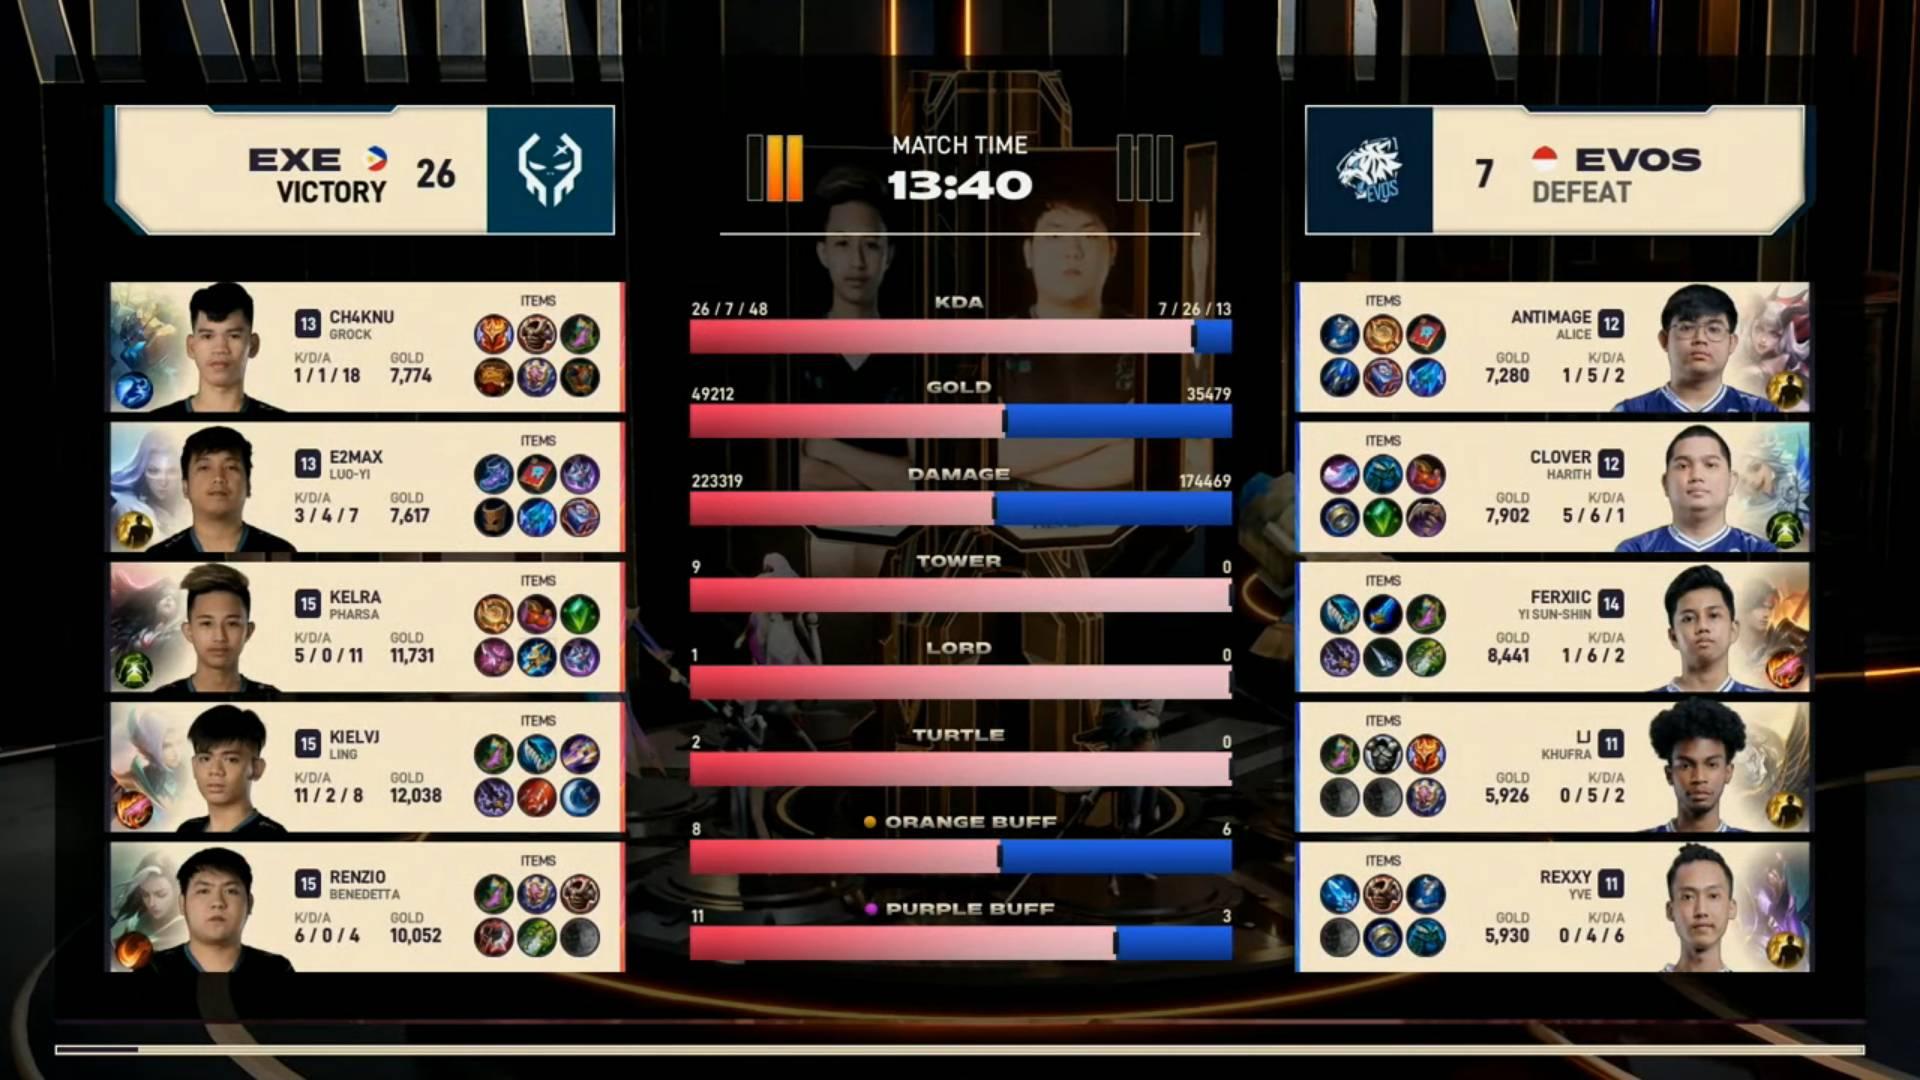 2021-MSC-Execration-def-EVOS-Legends-Game-2 Déjà Vu: Execration rises from lower bracket, sets up MSC showdown vs Blacklist ESports Mobile Legends MPL-PH News  - philippine sports news